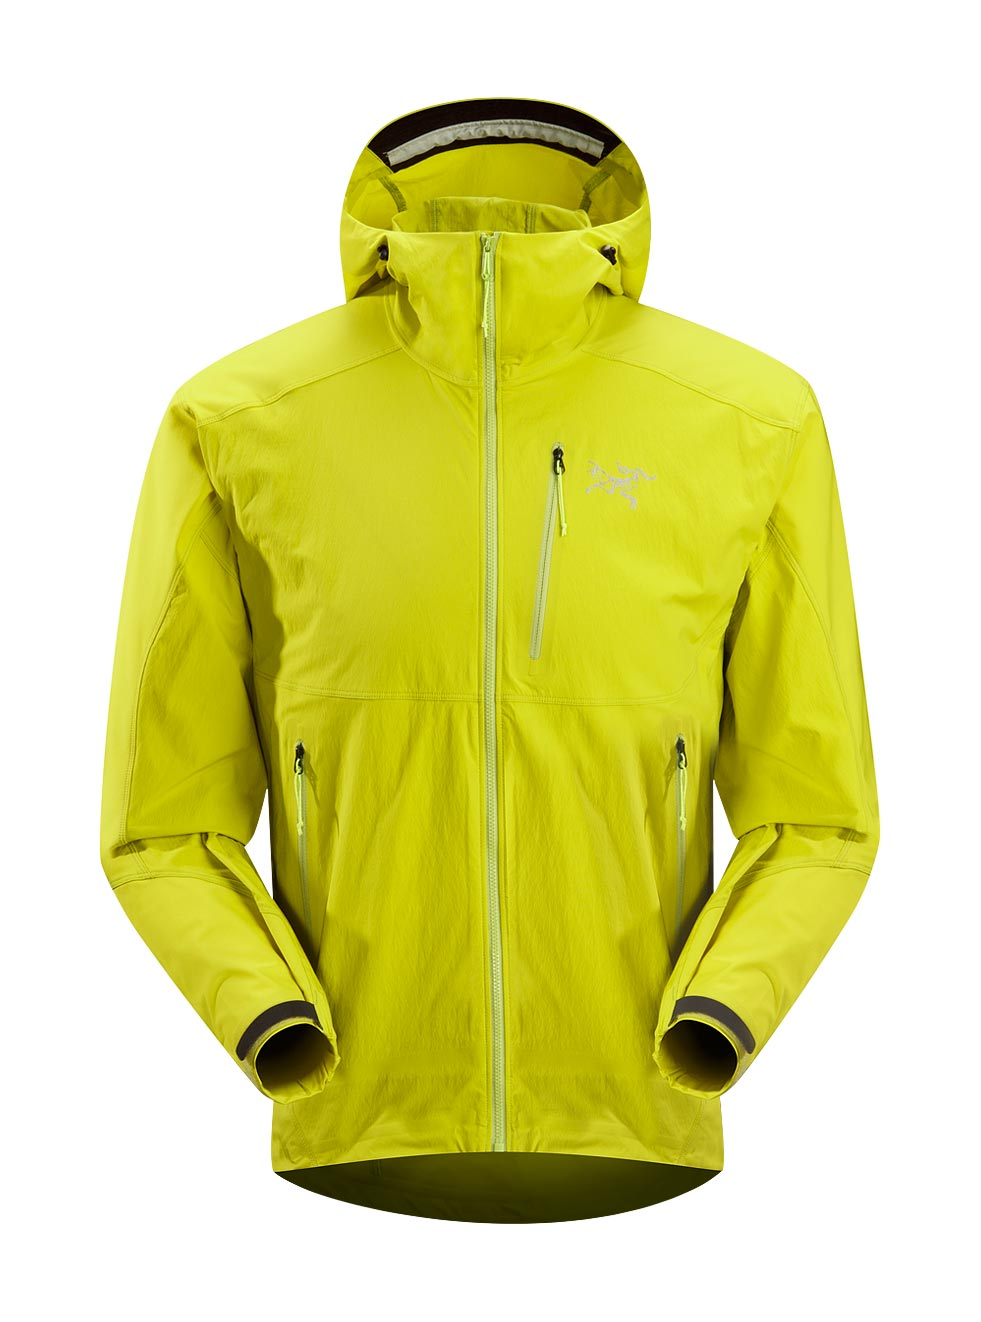 e2748ea0eed Cheap Arc'teryx Men's Hybrid Jackets Outlet Shop